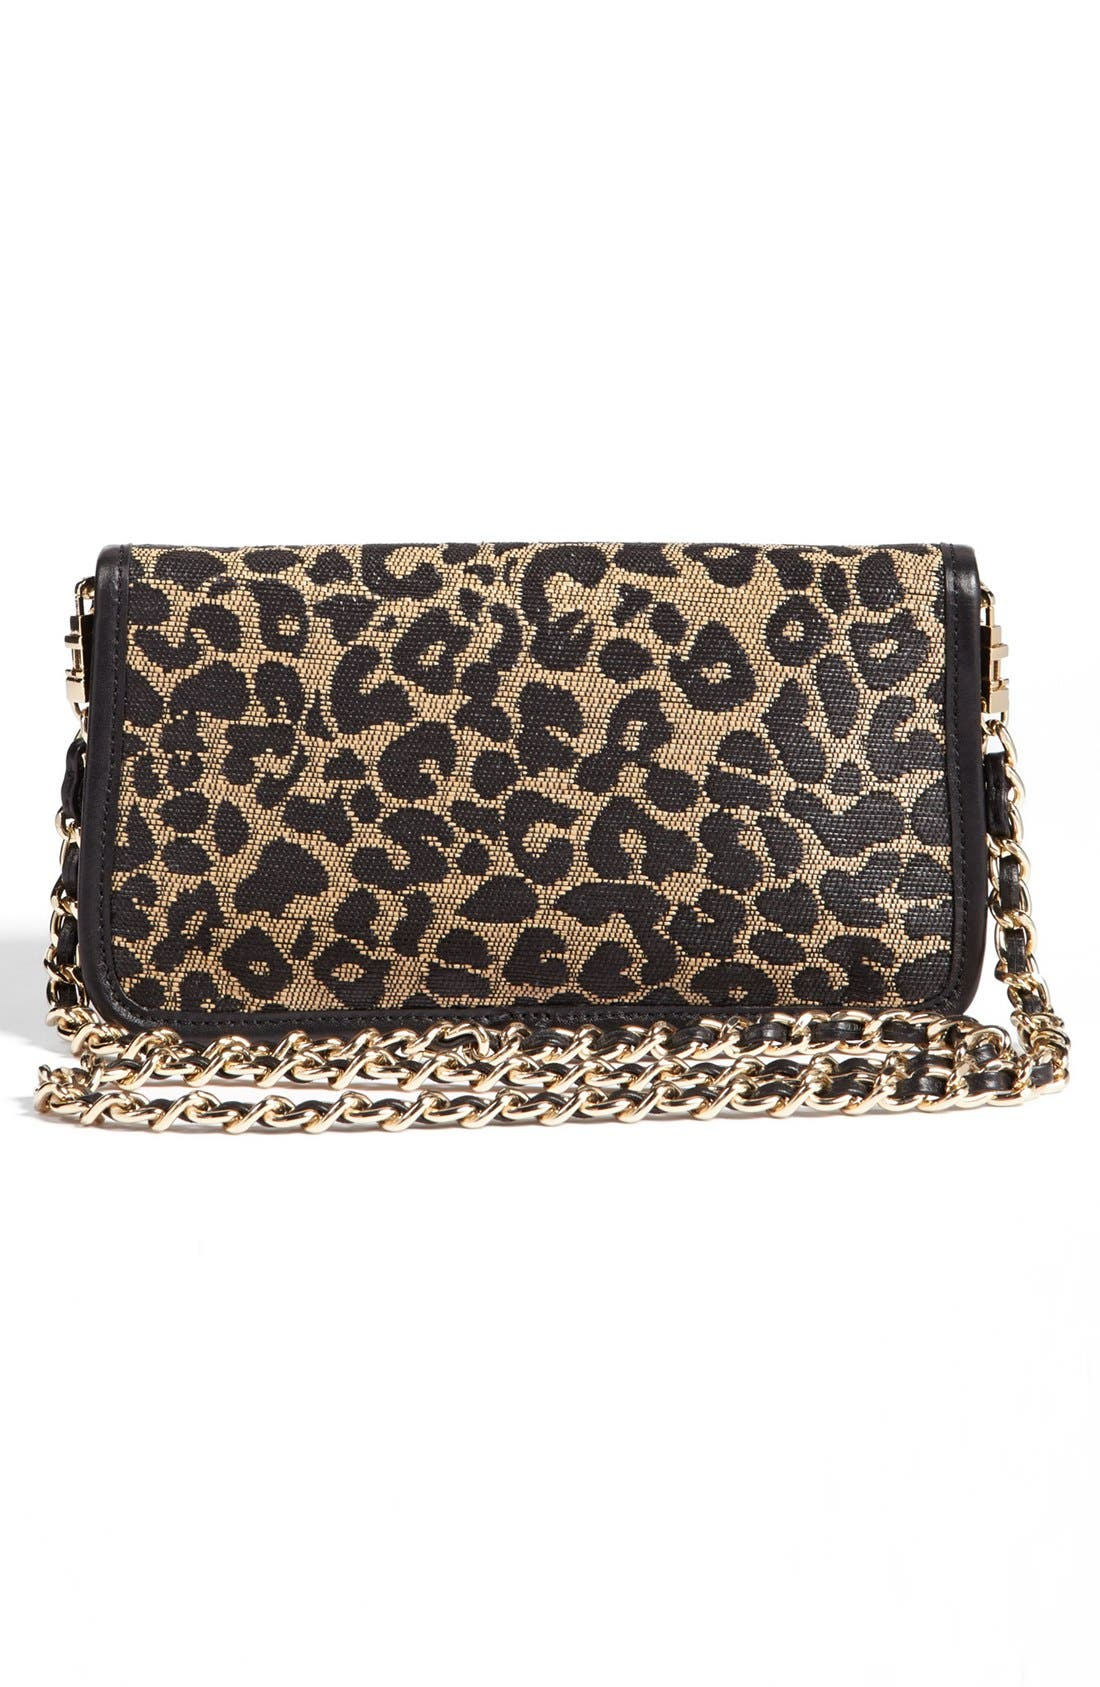 'Adalyn' Leopard Raffia Clutch,                             Alternate thumbnail 2, color,                             001